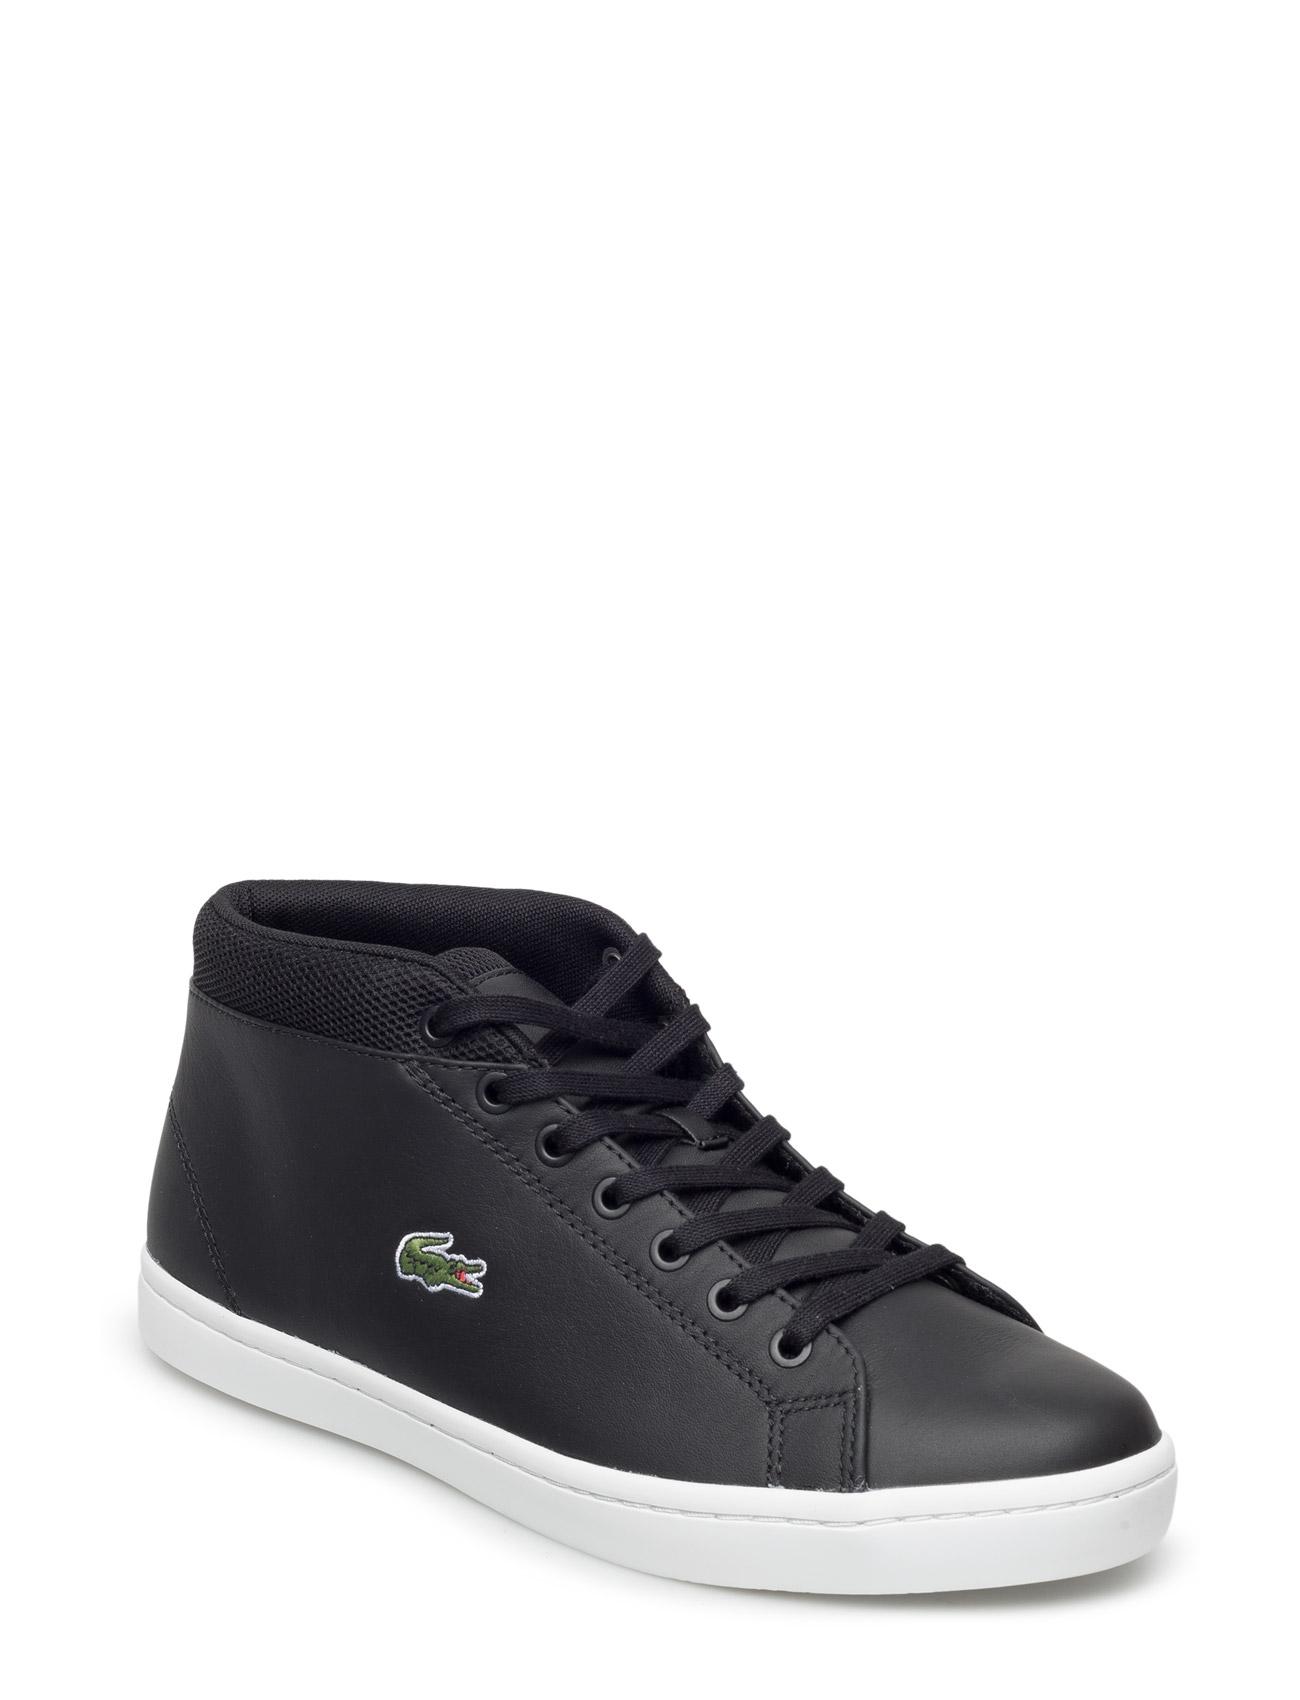 Straight Chukka3163 Lacoste Shoes Sneakers til Mænd i Sort